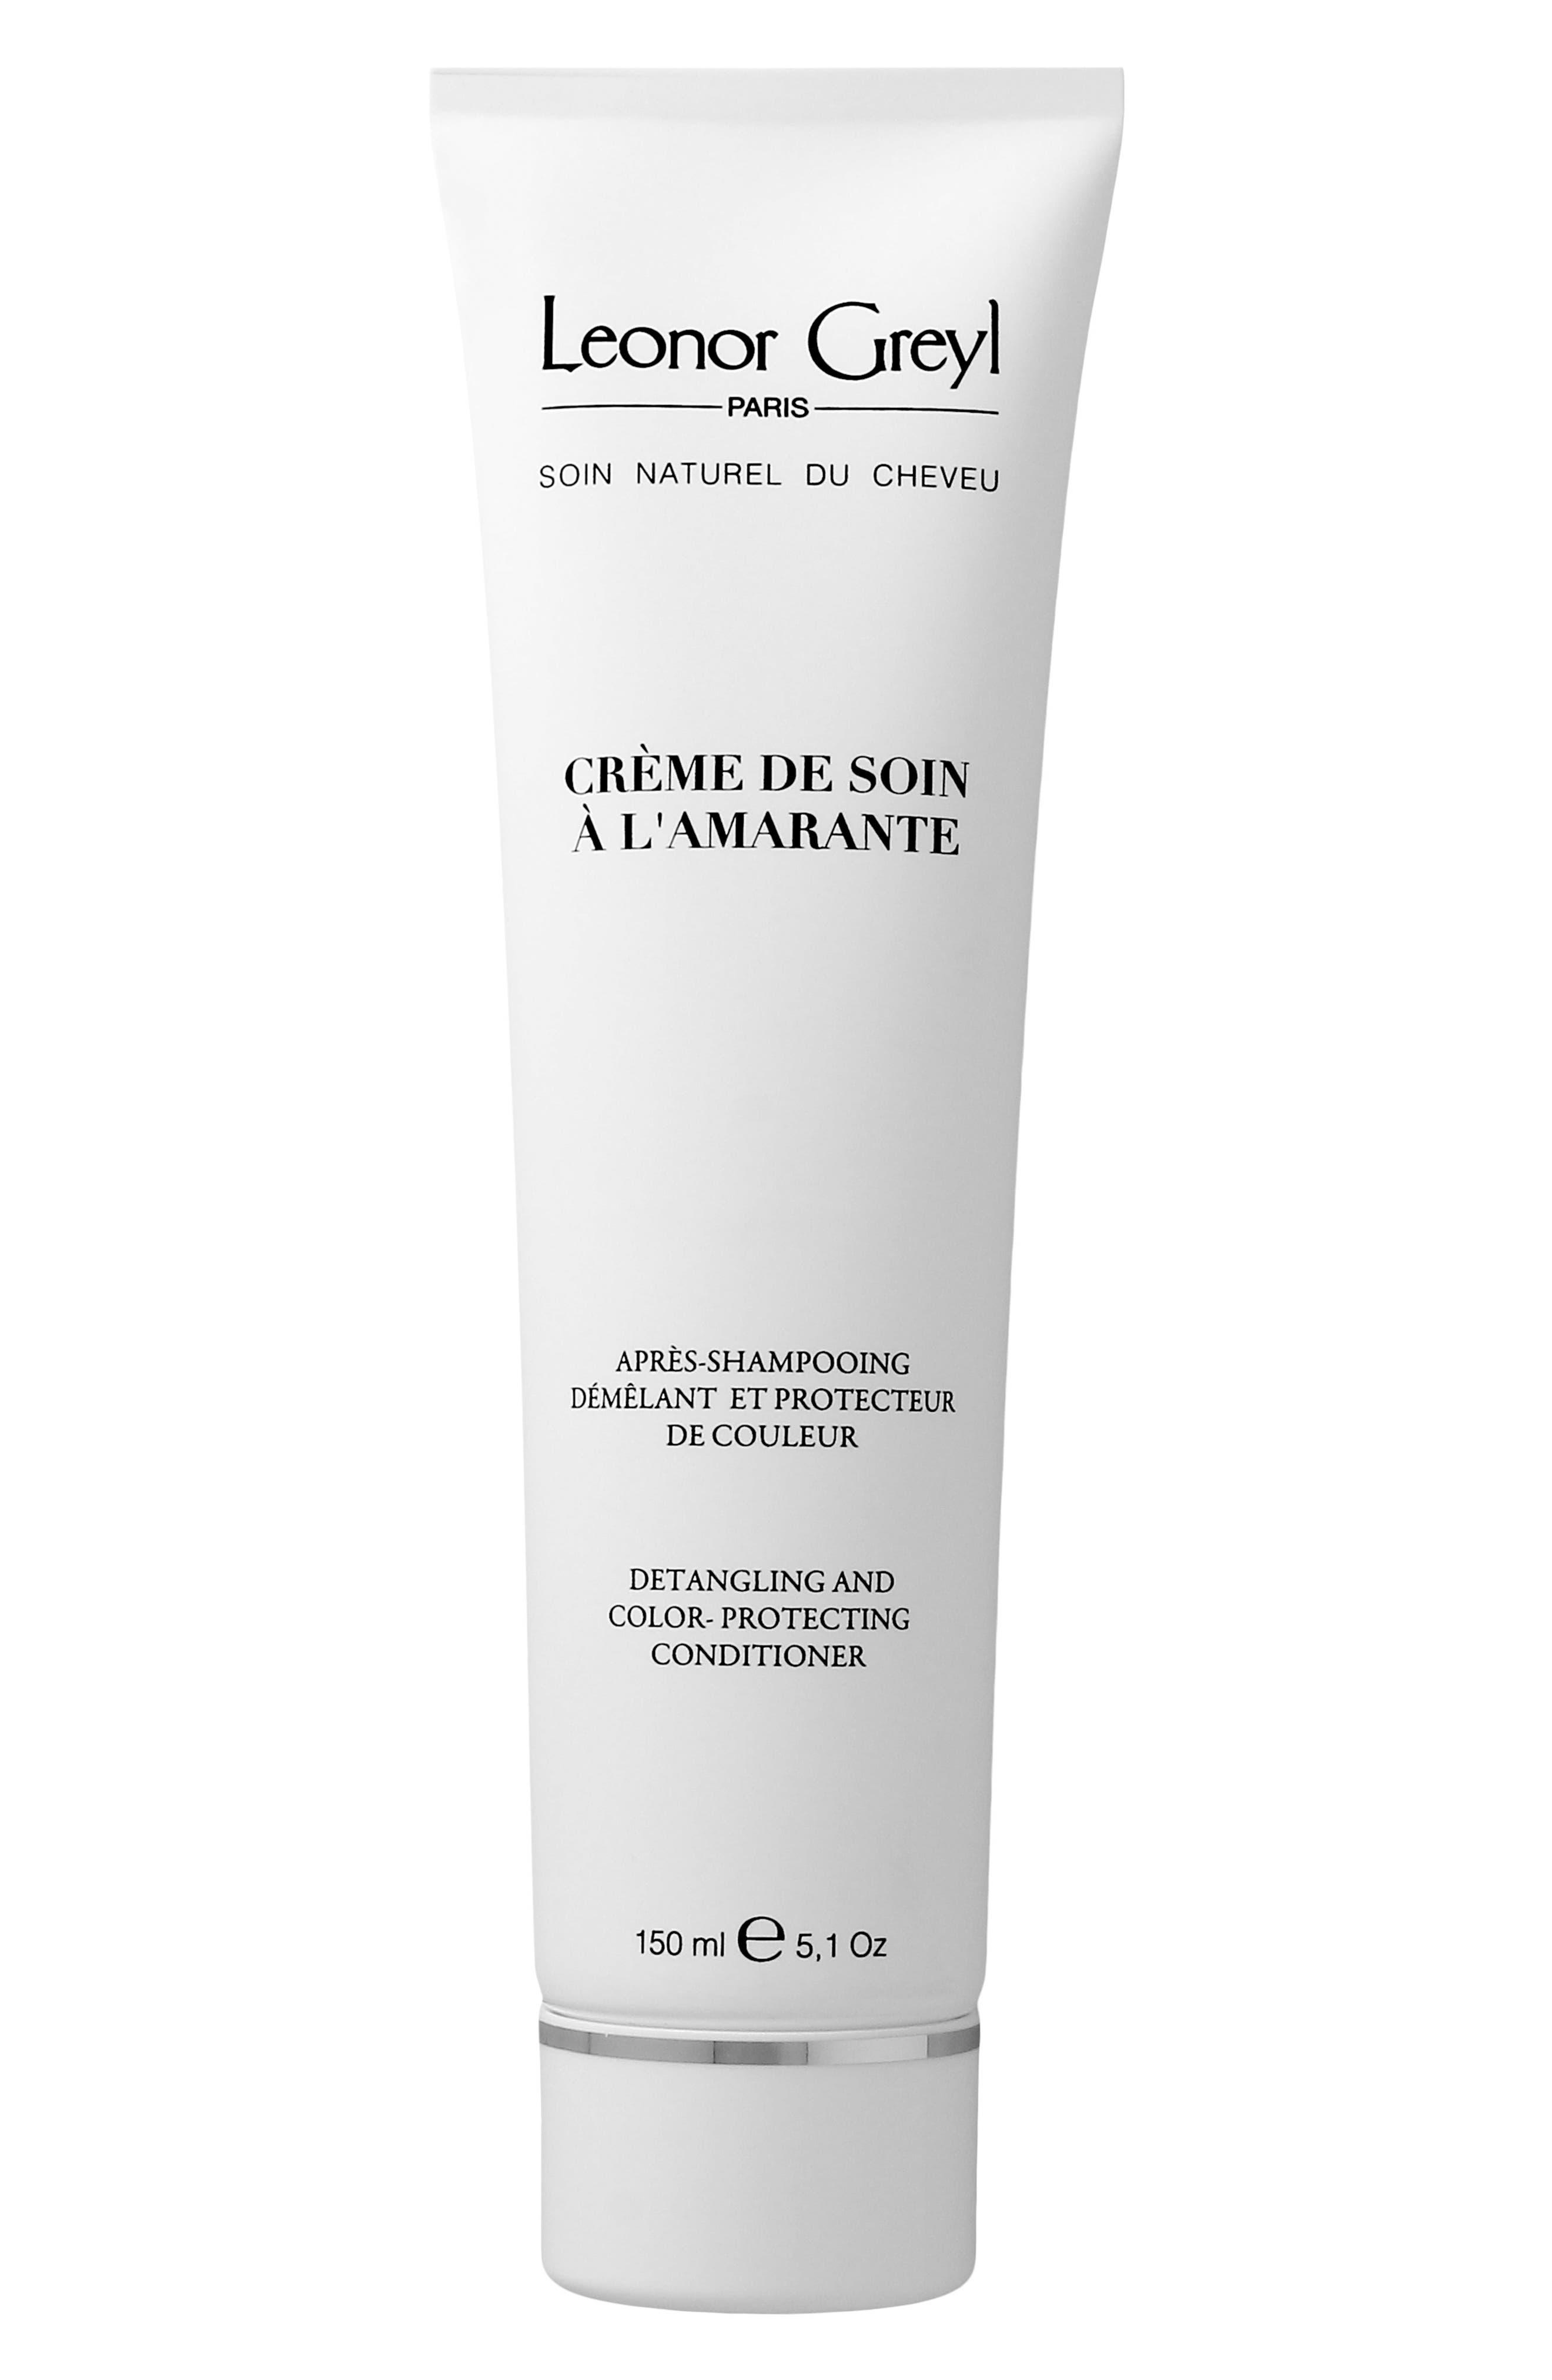 Alternate Image 1 Selected - Leonor Greyl PARIS Crème de Soin a l'Amarante Conditioner